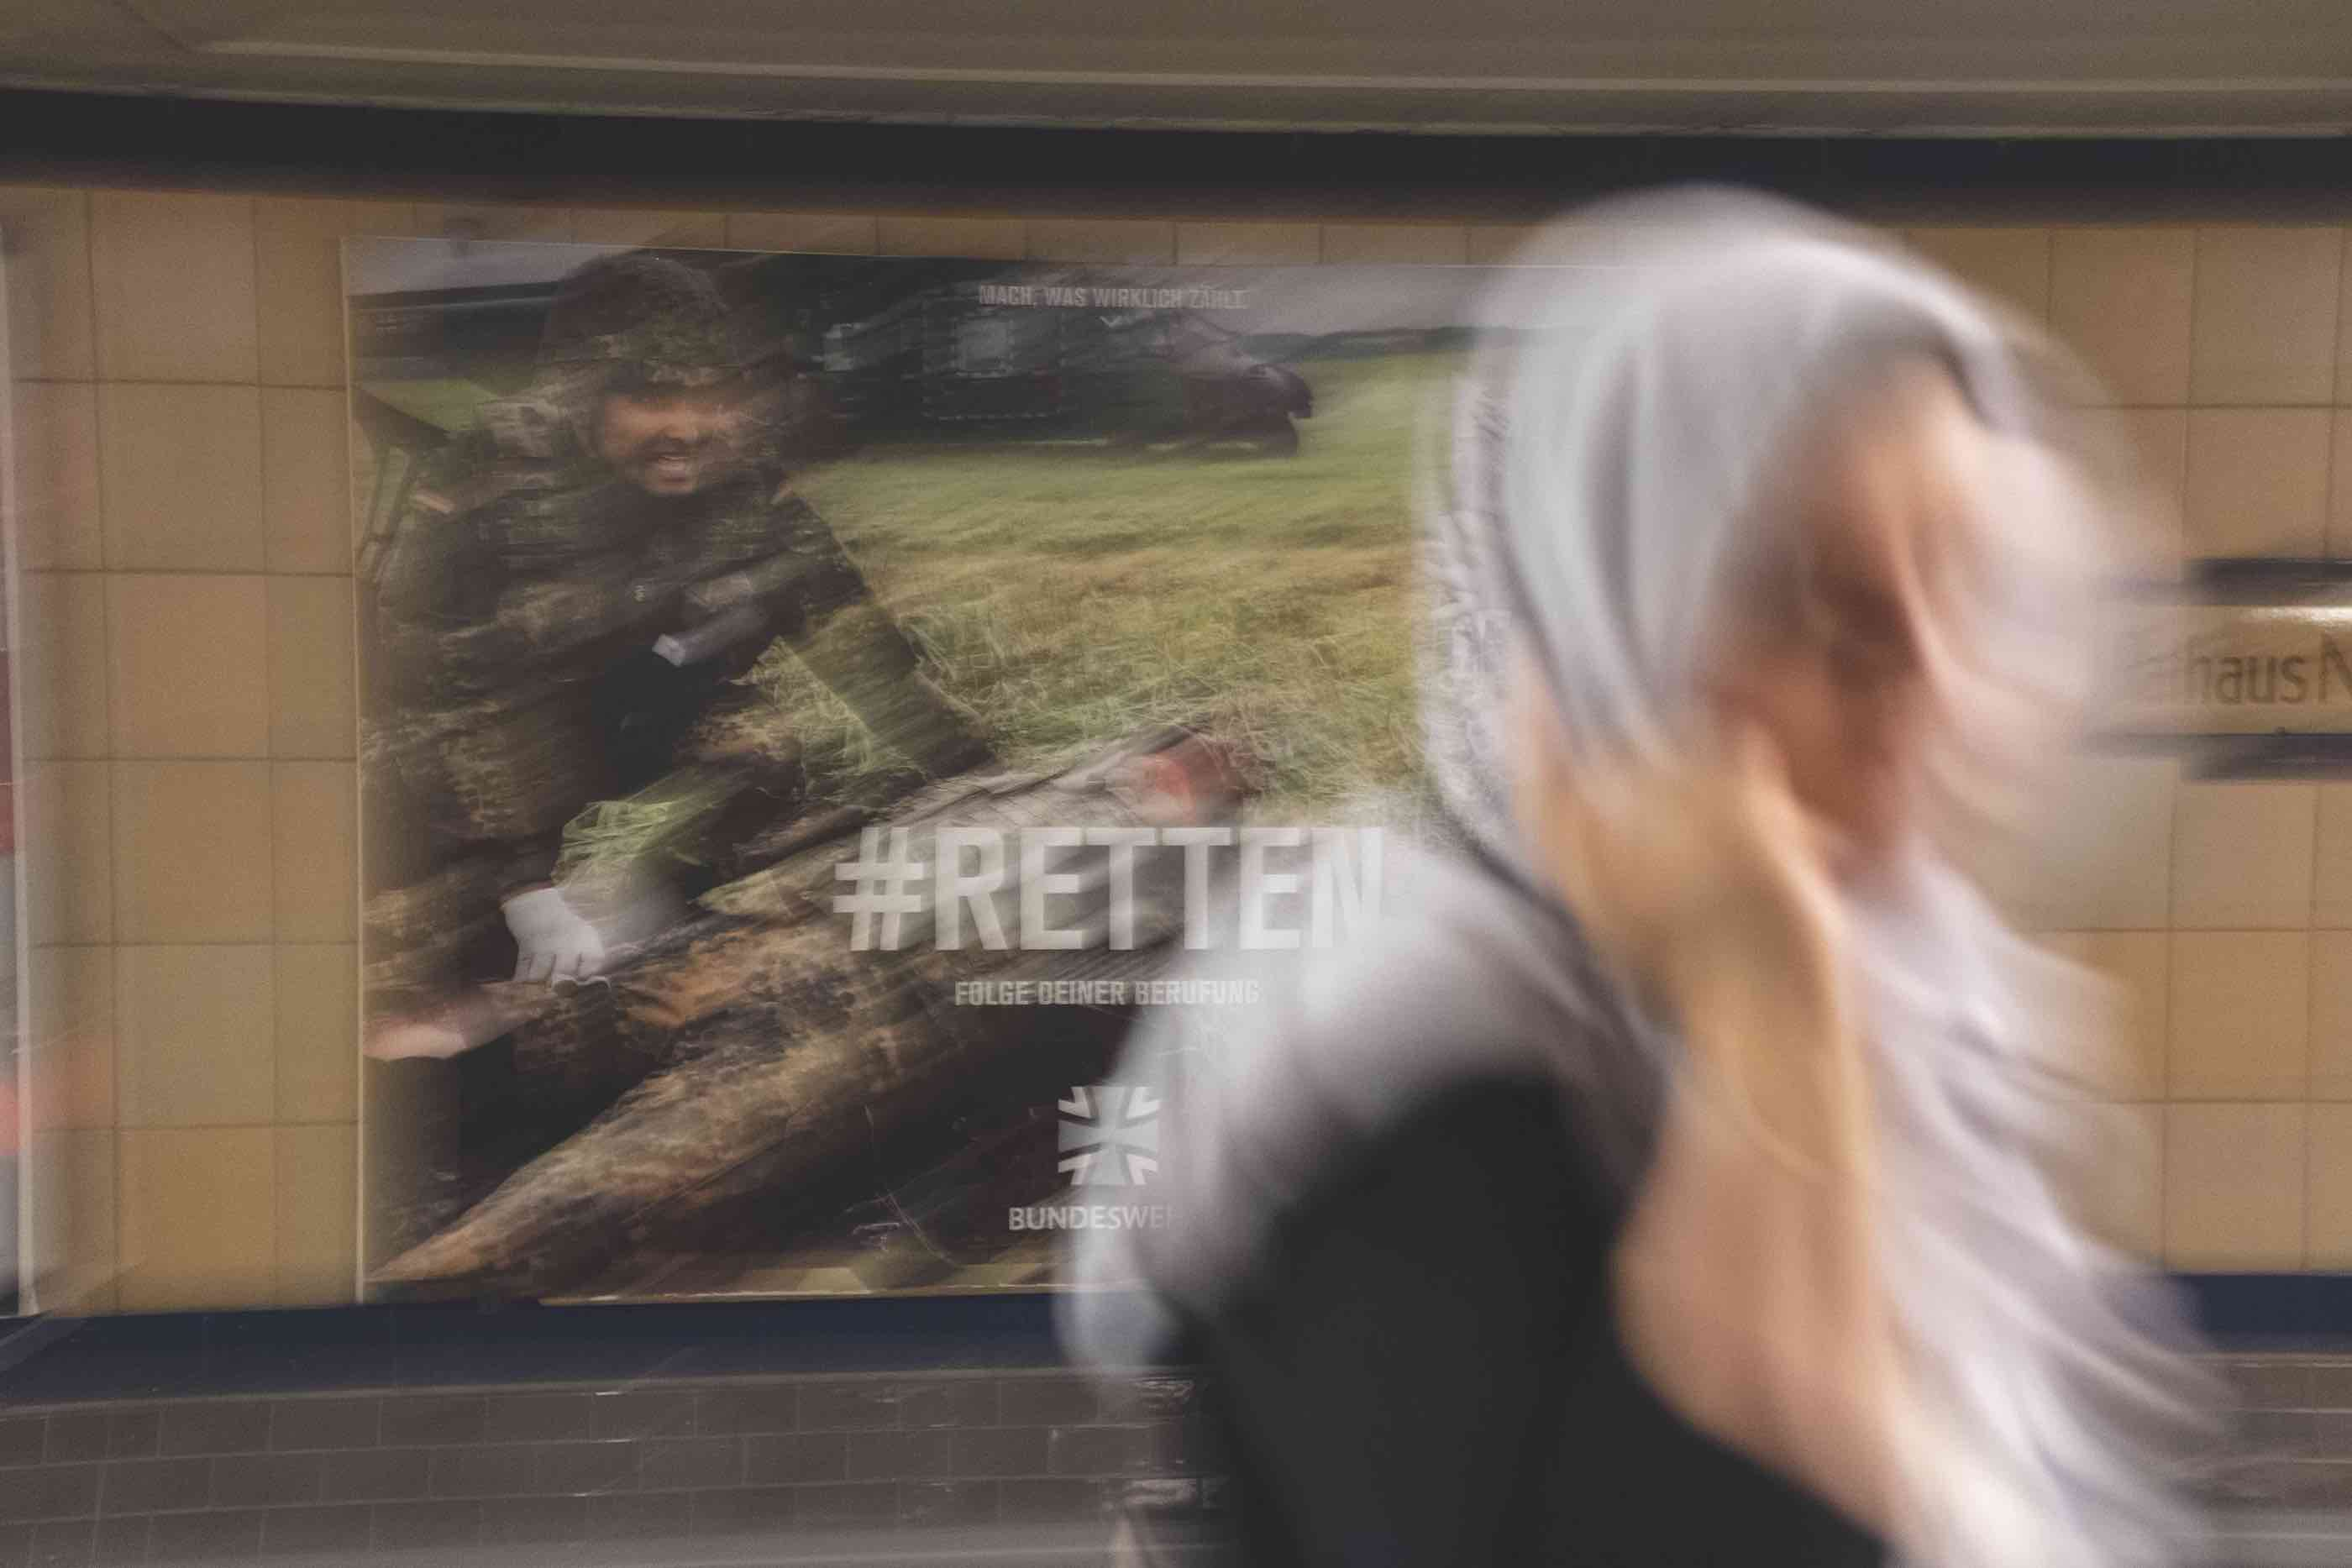 Military recruiting advert. Berlin, August 2019.